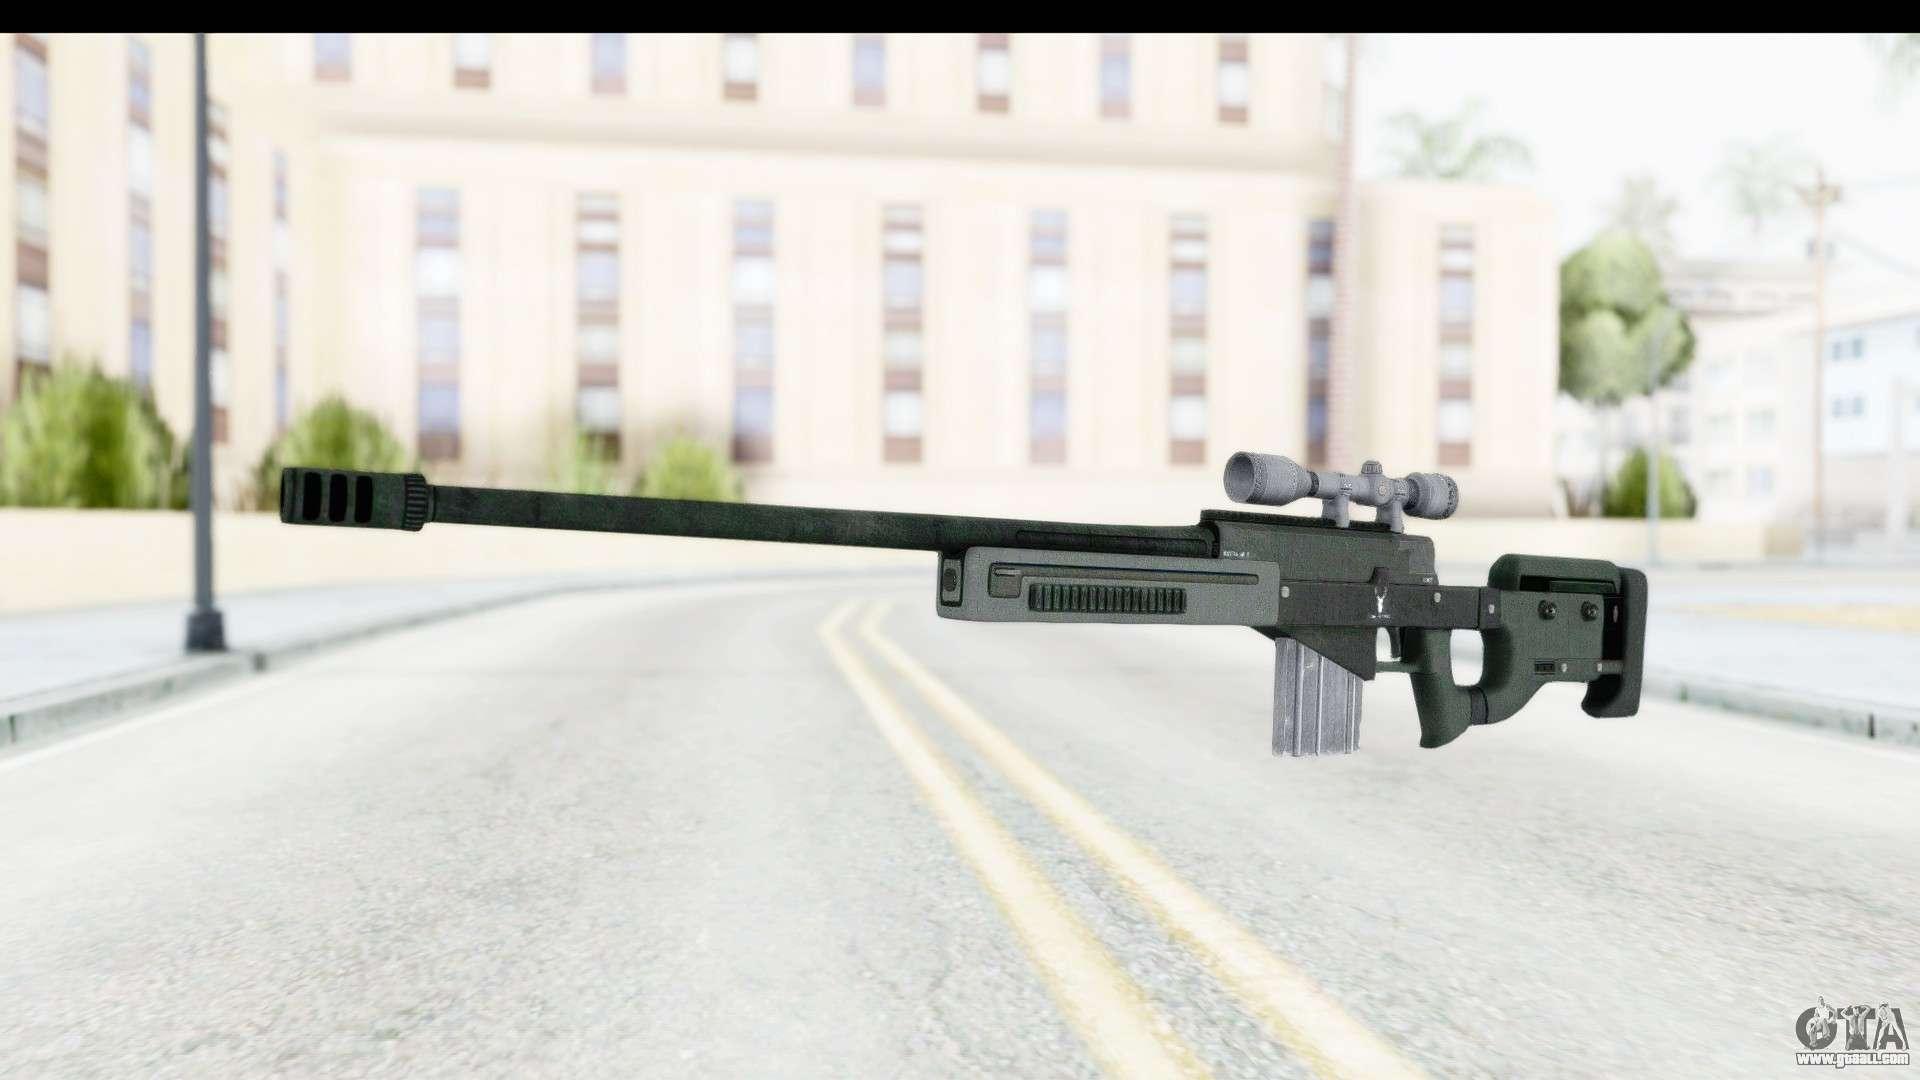 Gta 5 mods GTA San Andreas — weapon mods — page 11